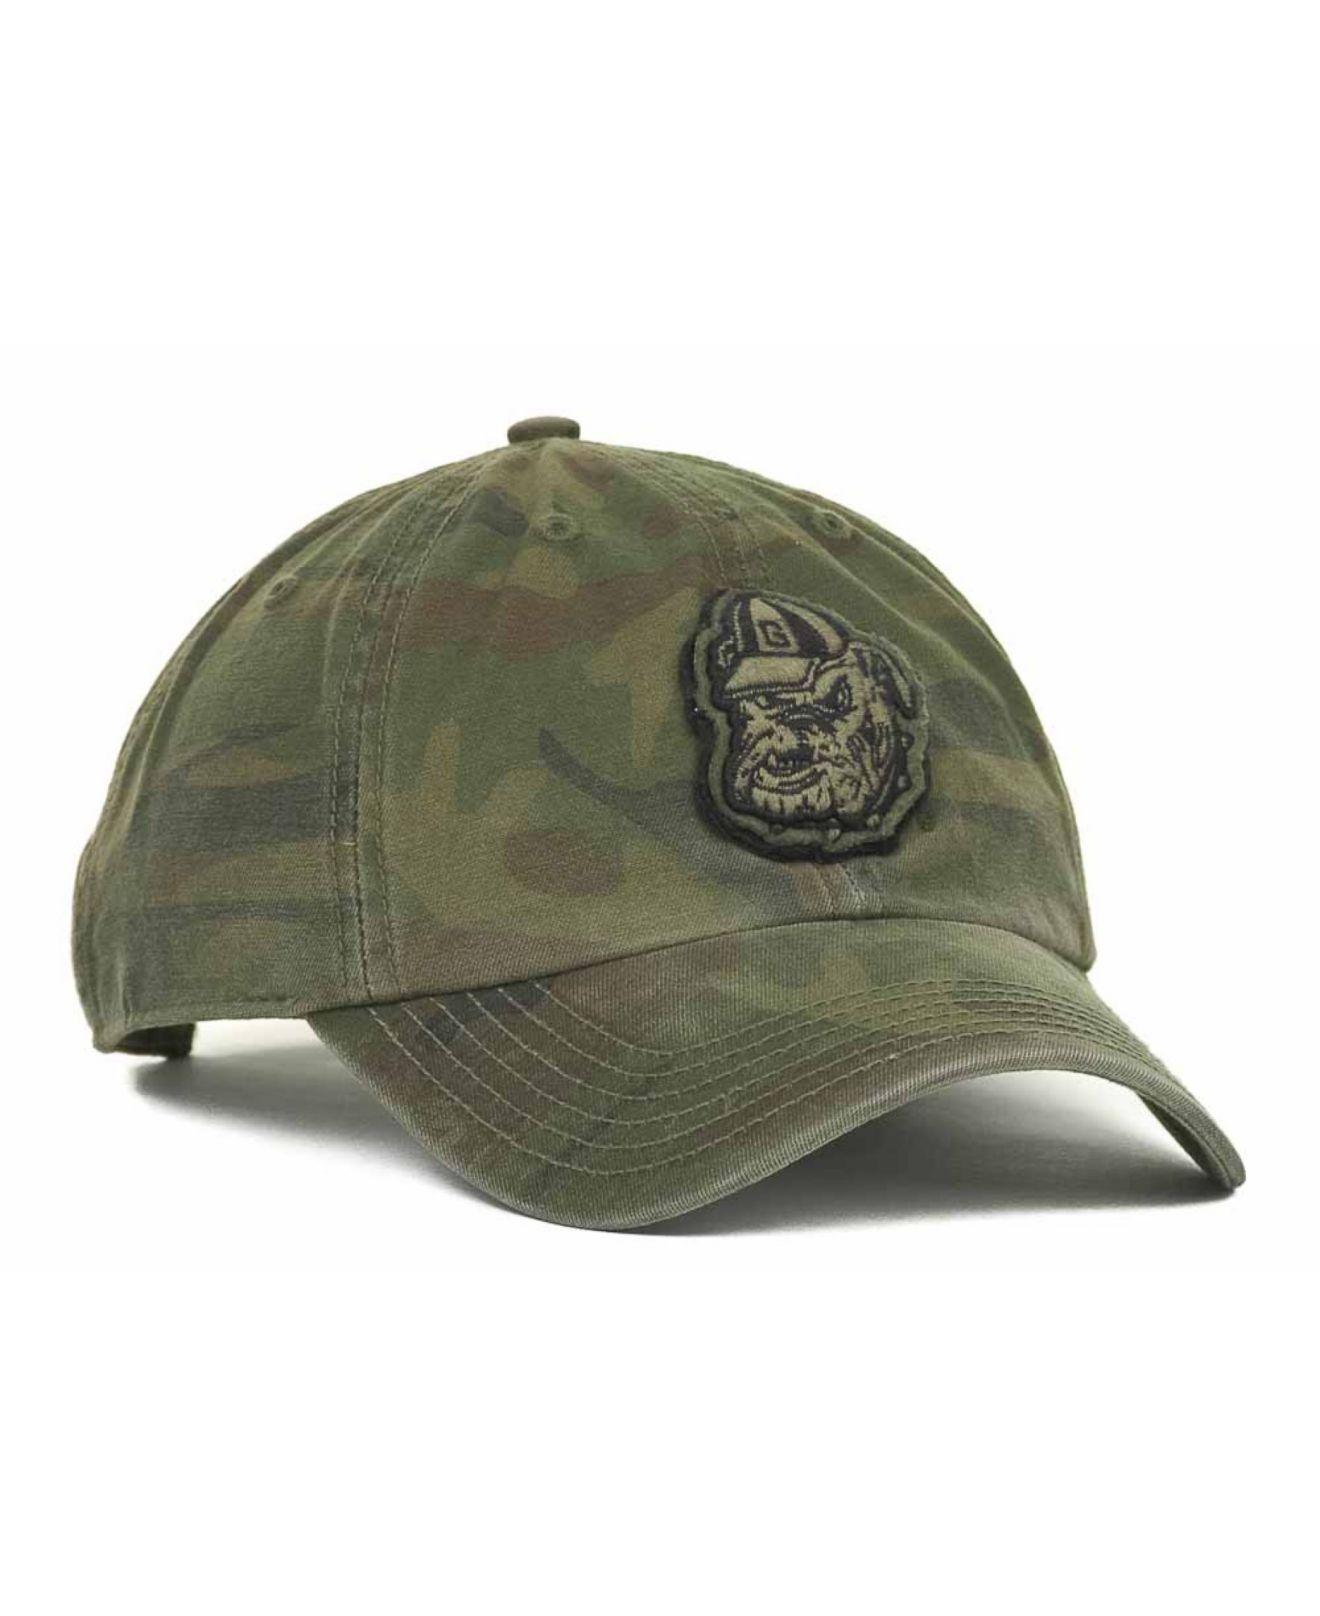 c606c9dad446e Lyst - 47 Brand Georgia Bulldogs Oht Movement Clean Up Cap in Green ...